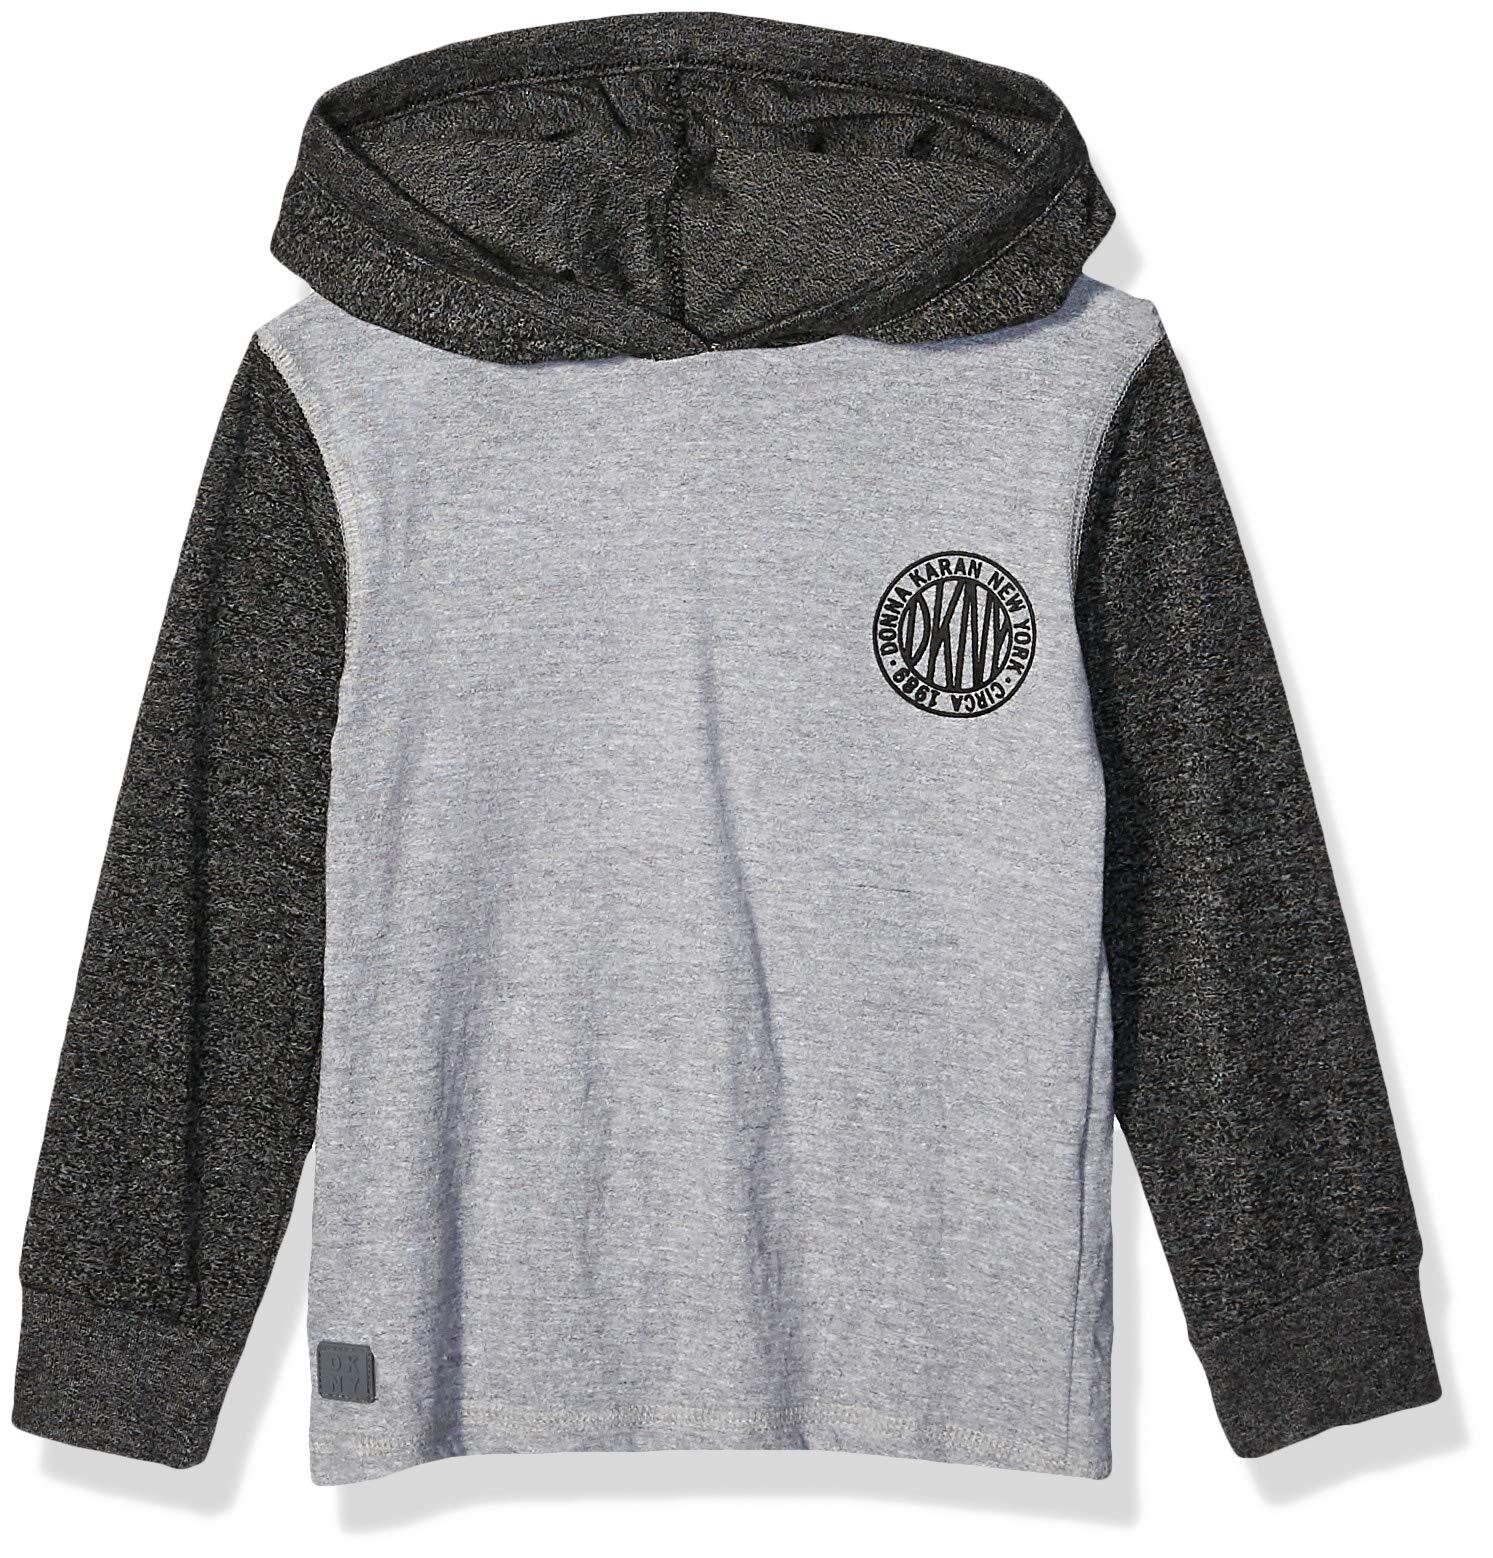 DKNY Boys' Long Sleeve T-Shirt (More Styles Available)